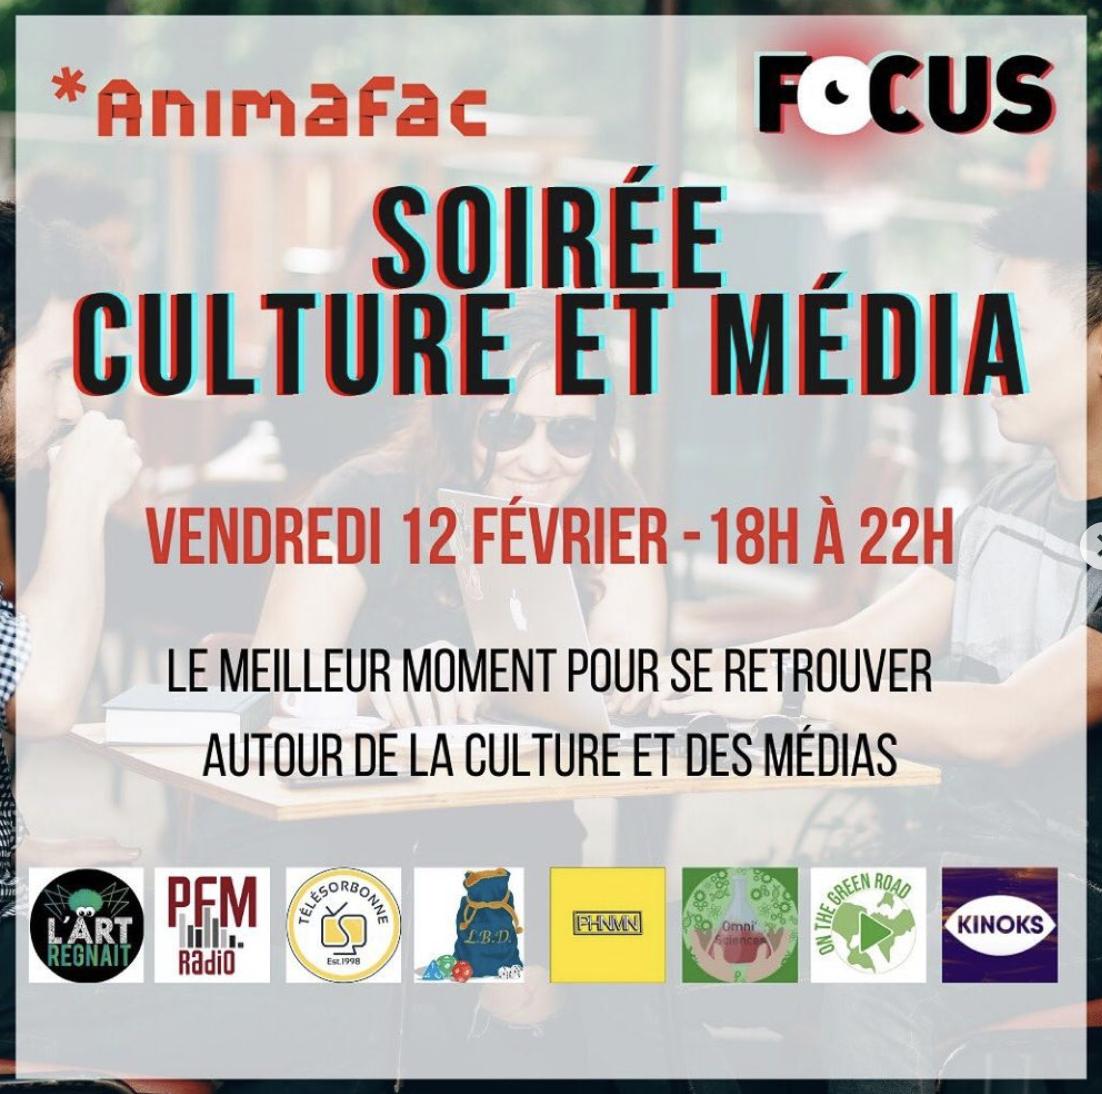 Soirée culture et média Focus Animafac